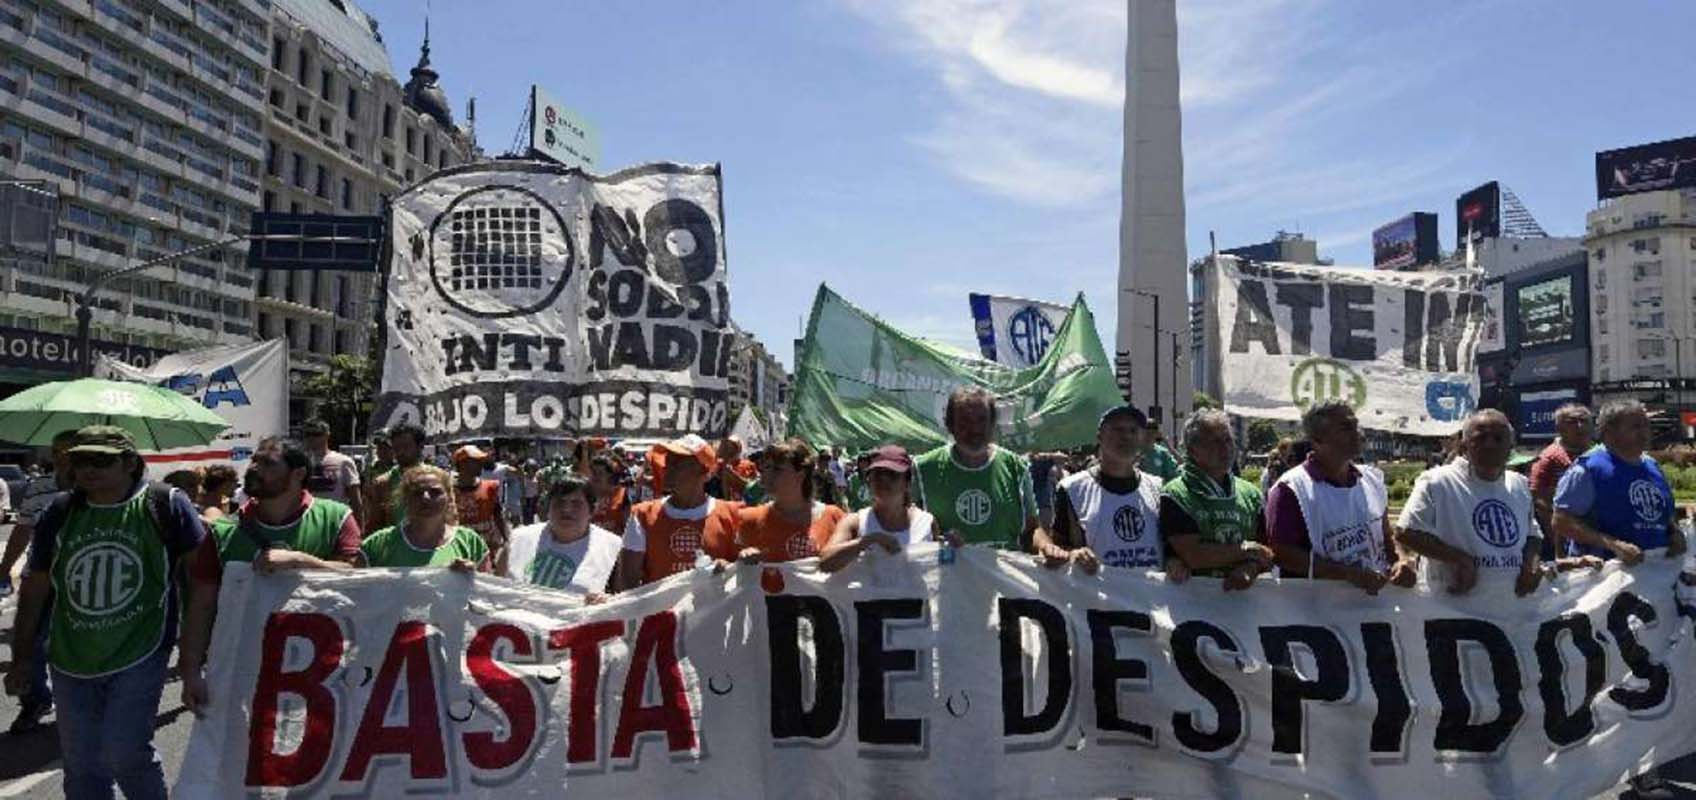 Sindicatos protestan en Argentina contra políticas de Macri